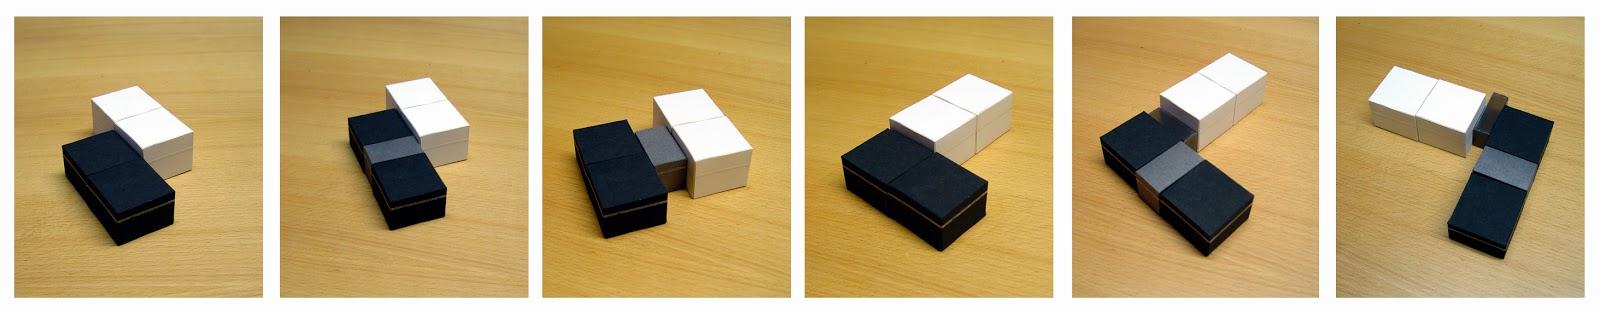 combinacion-modulos-viviendas-resan-modular